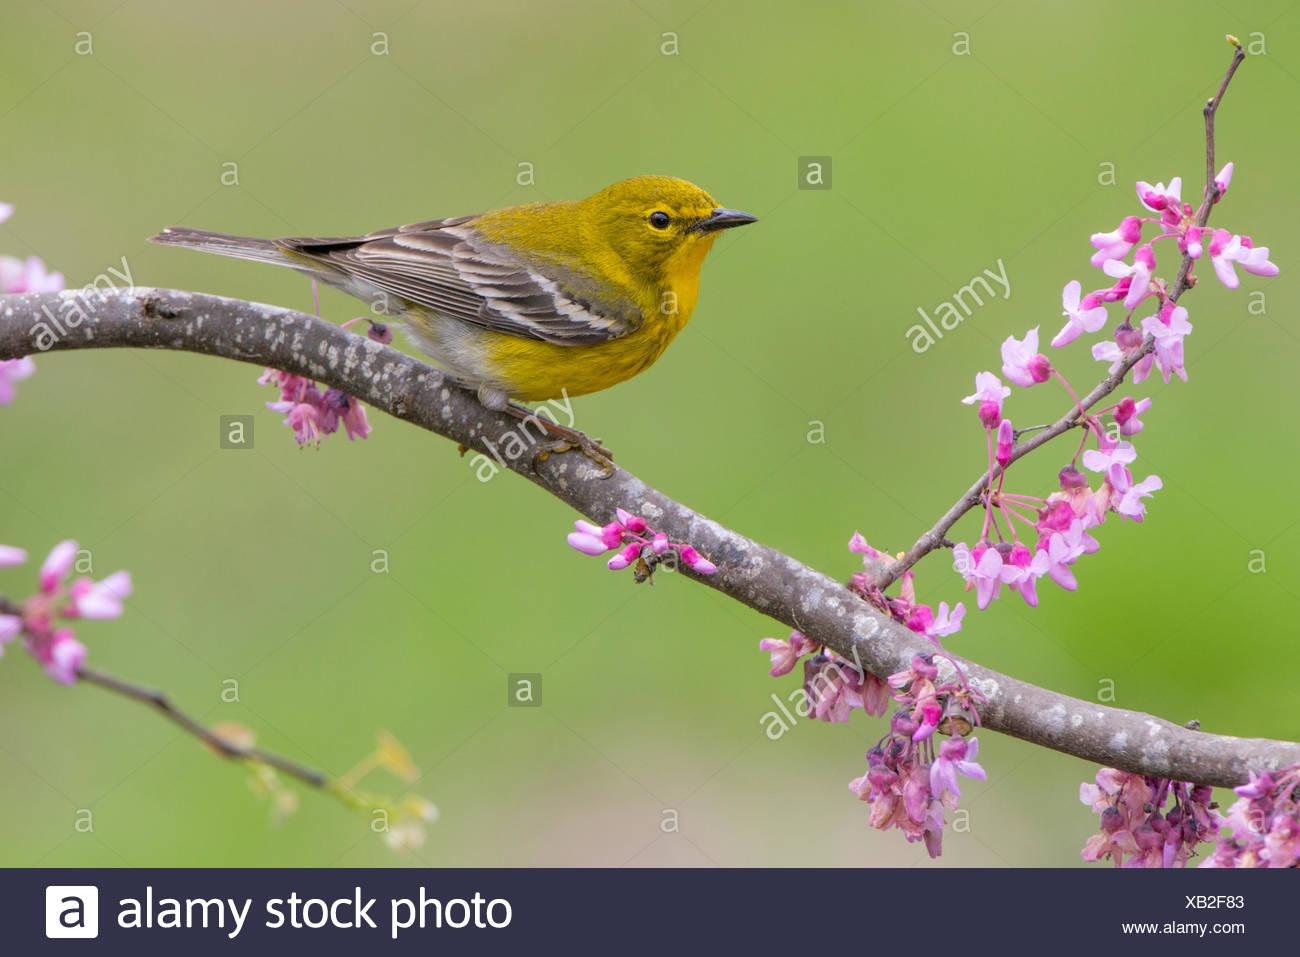 Pine Warbler, Setophaga pinus, Houston, Texas, USA - Stock Image